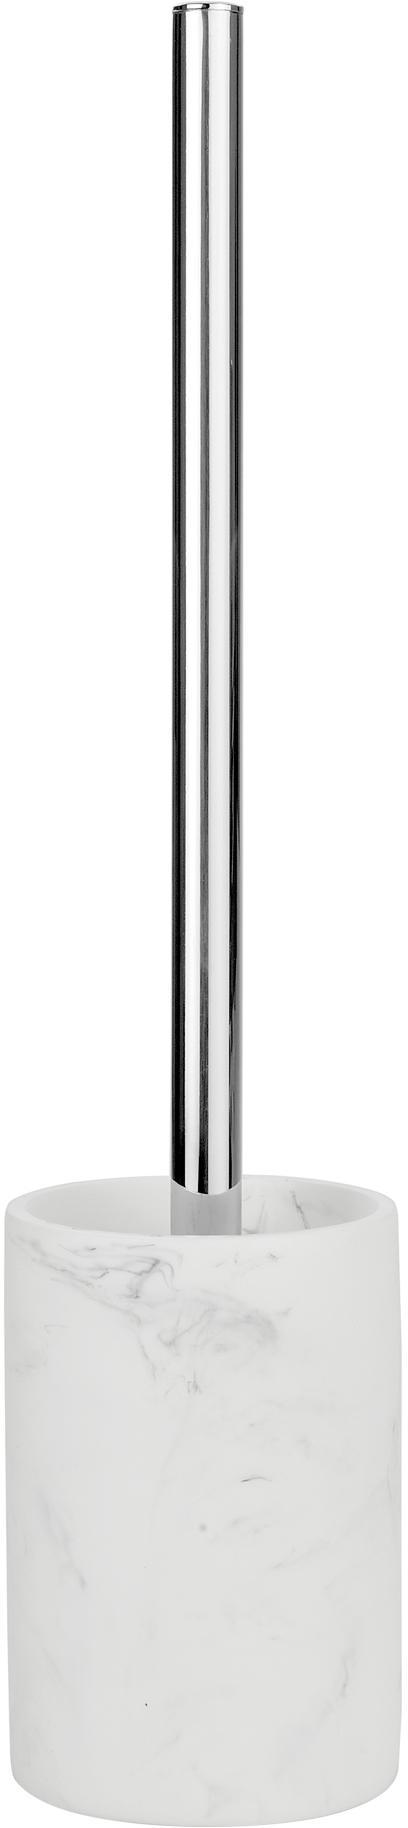 Toiletborstel Swan, Houder: kunststof (polyresin), Houder: gemarmerd wit. Handvat: zilverkleurig, Ø 9 x H 40 cm